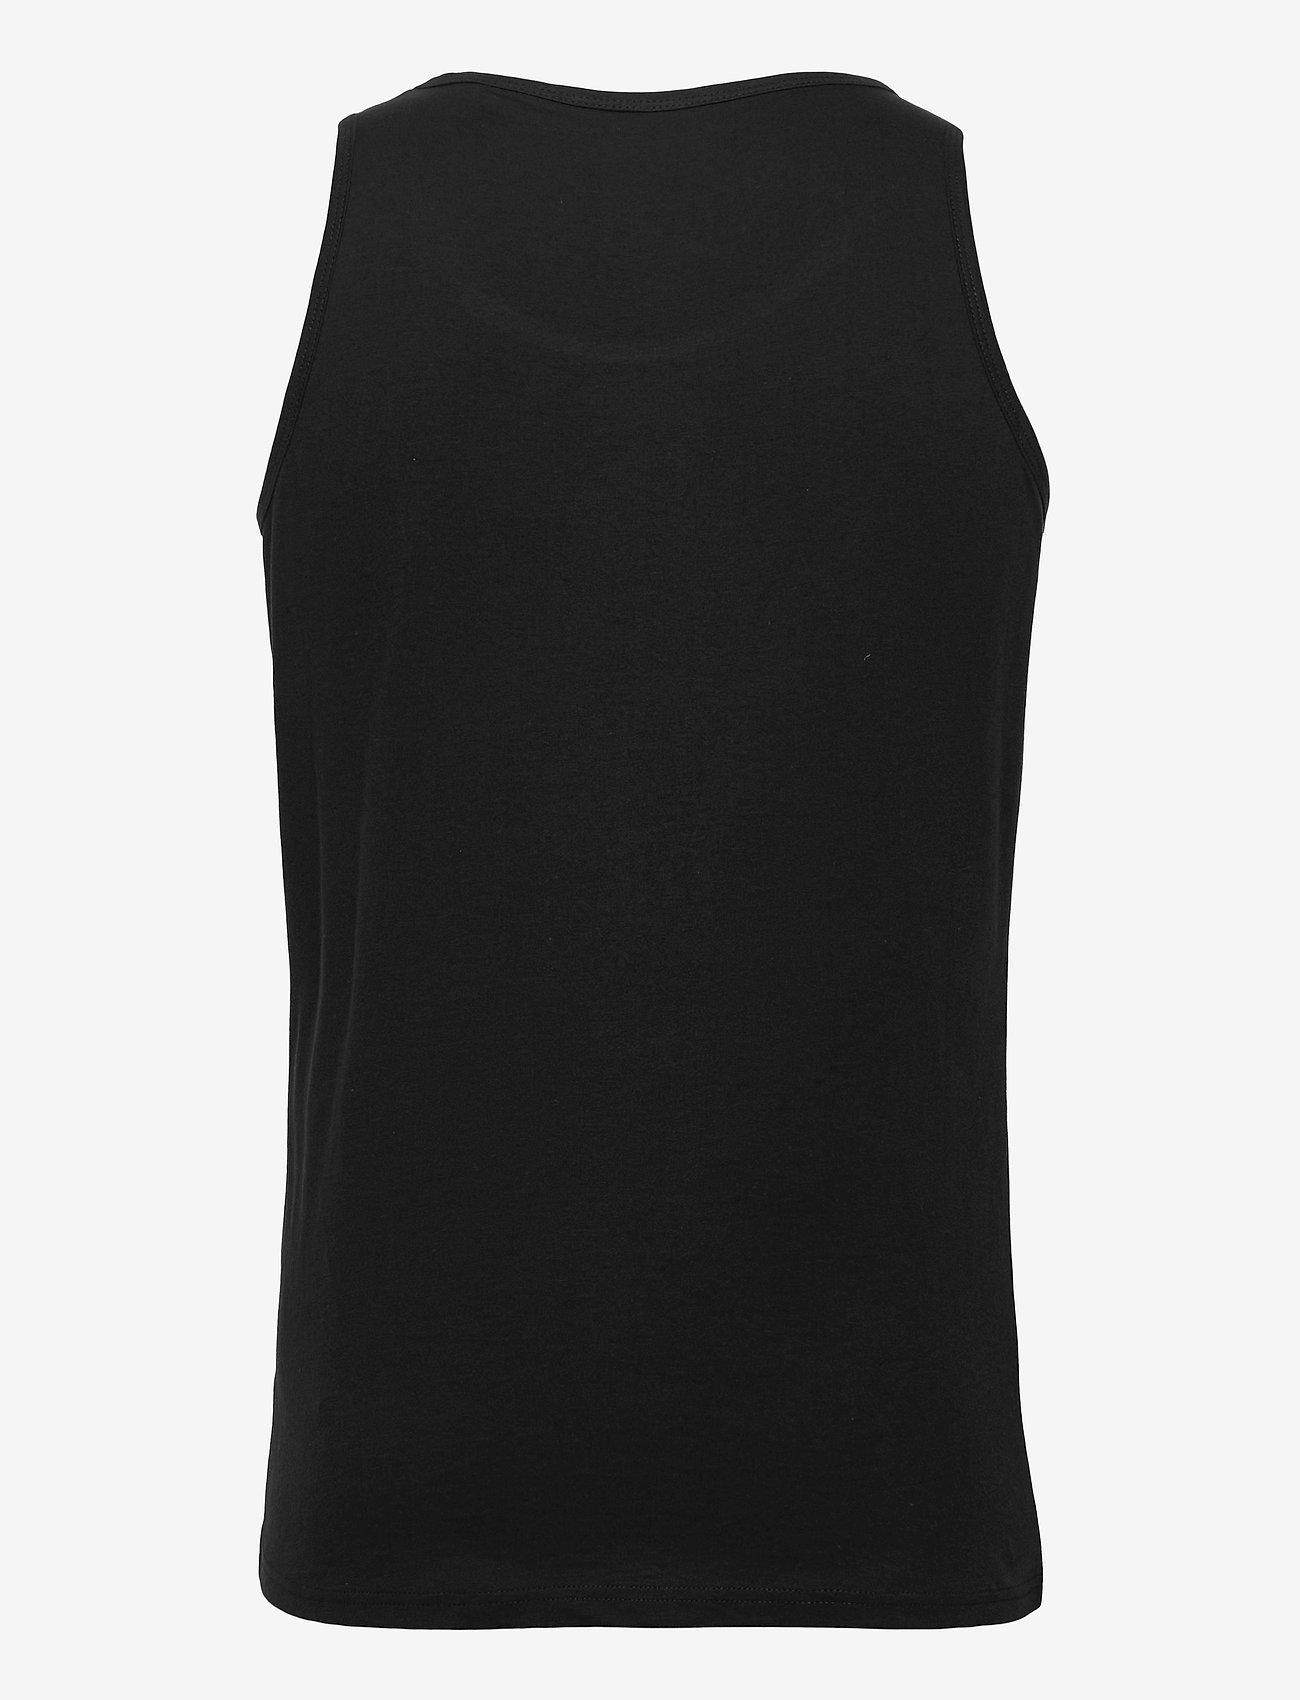 Knowledge Cotton Apparel - PALM owl chest tank top - GOTS/Vega - mouwenloze t-shirts - black jet - 1